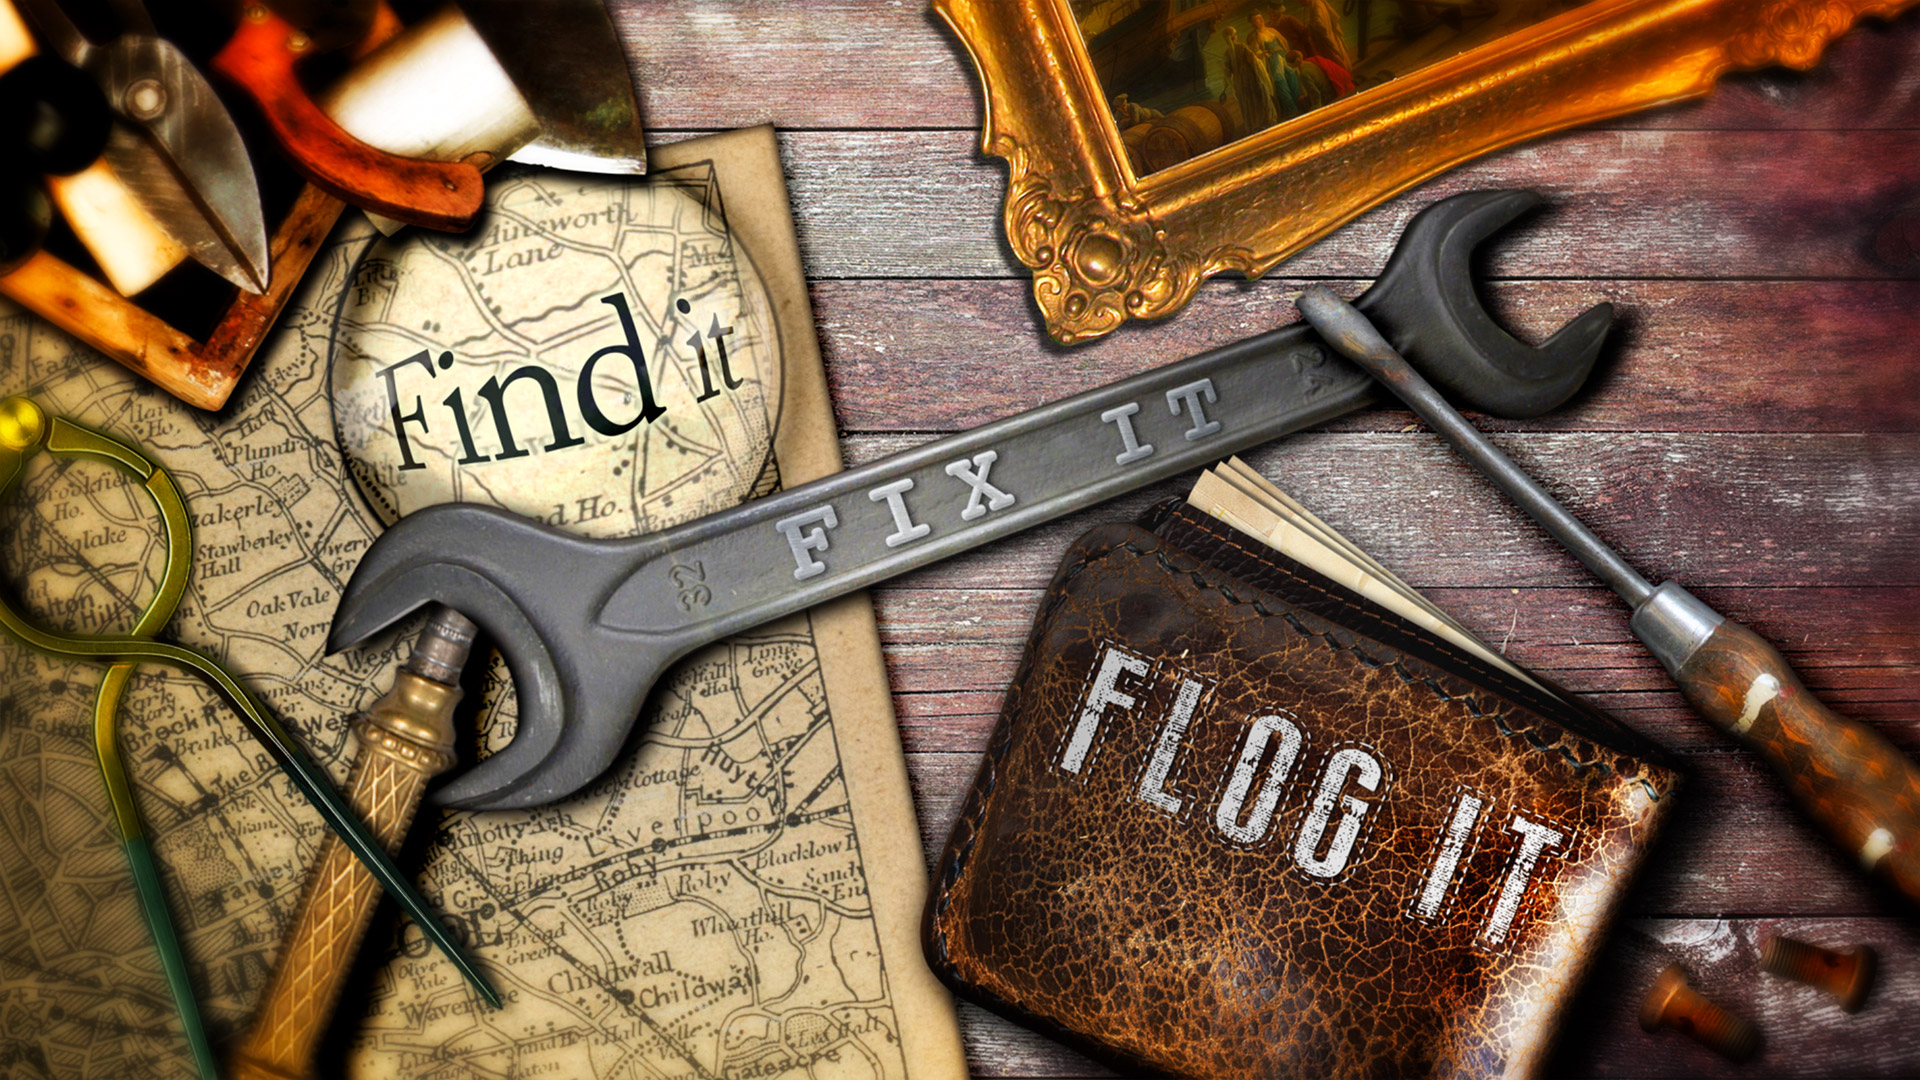 Find It, Fix It, Flog It © Holey & Moley Ltd Channel 4